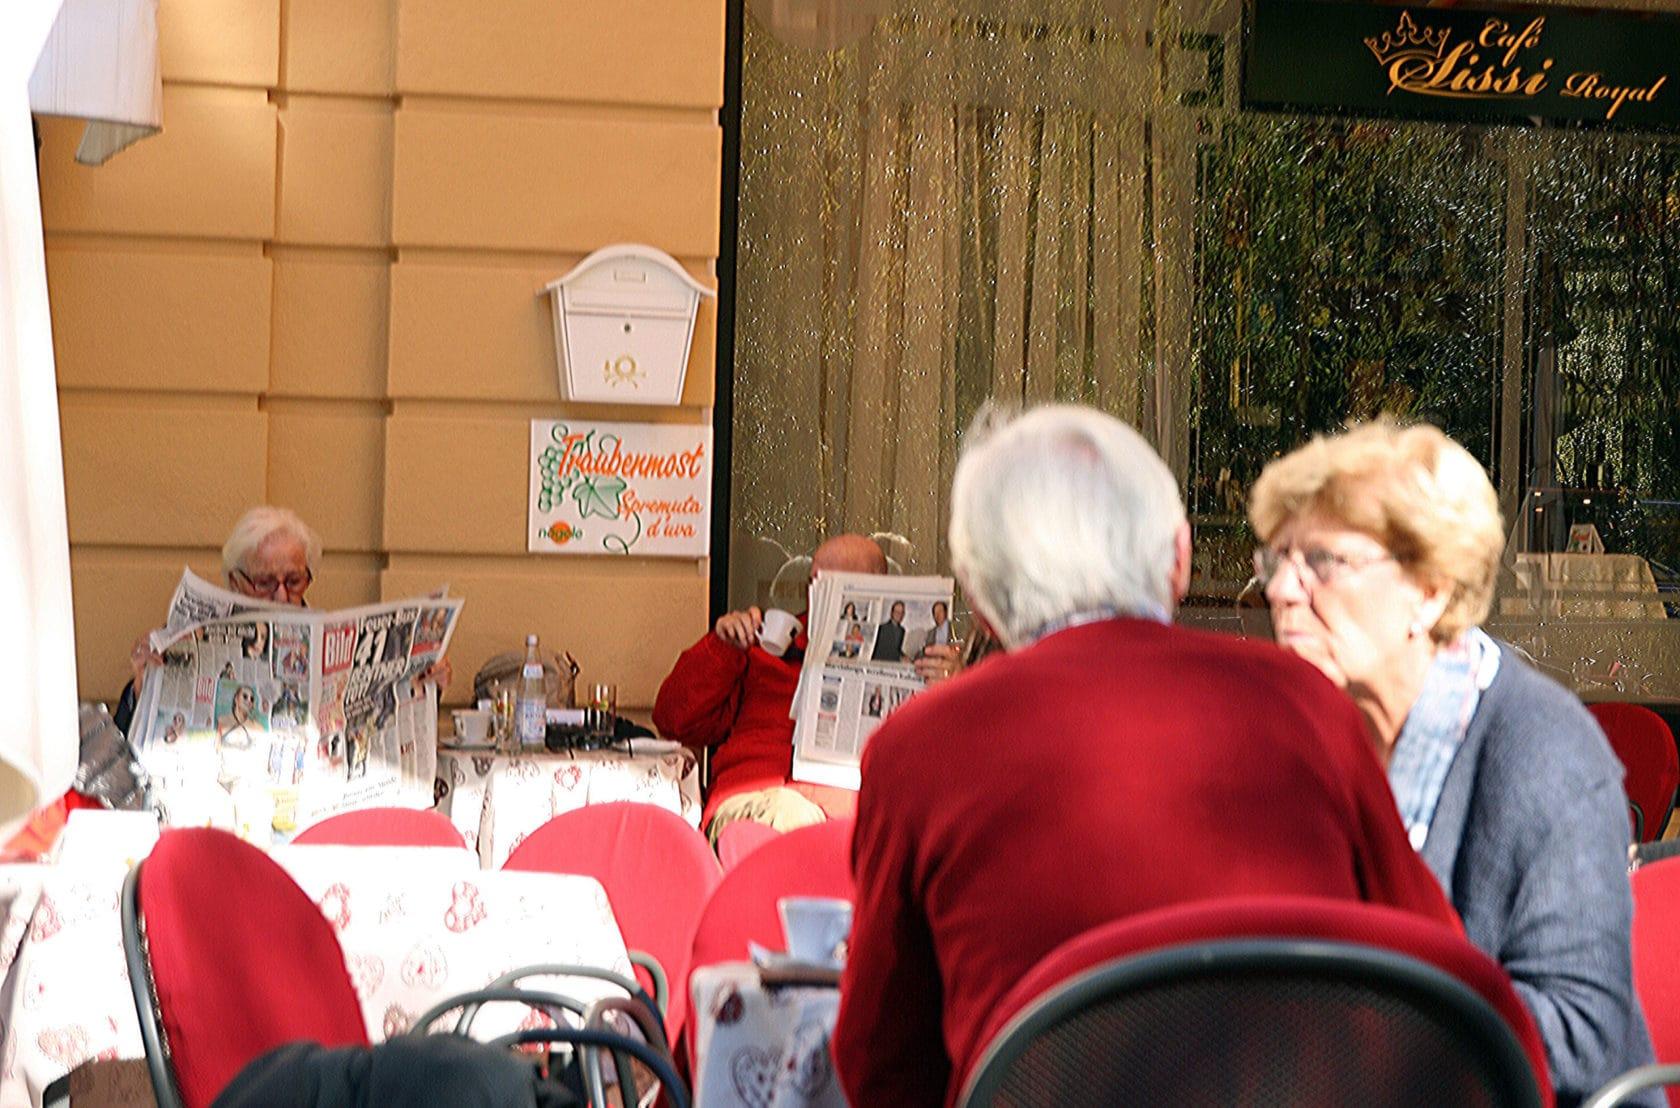 gelassene Zeitungslektüre im Café in Meran